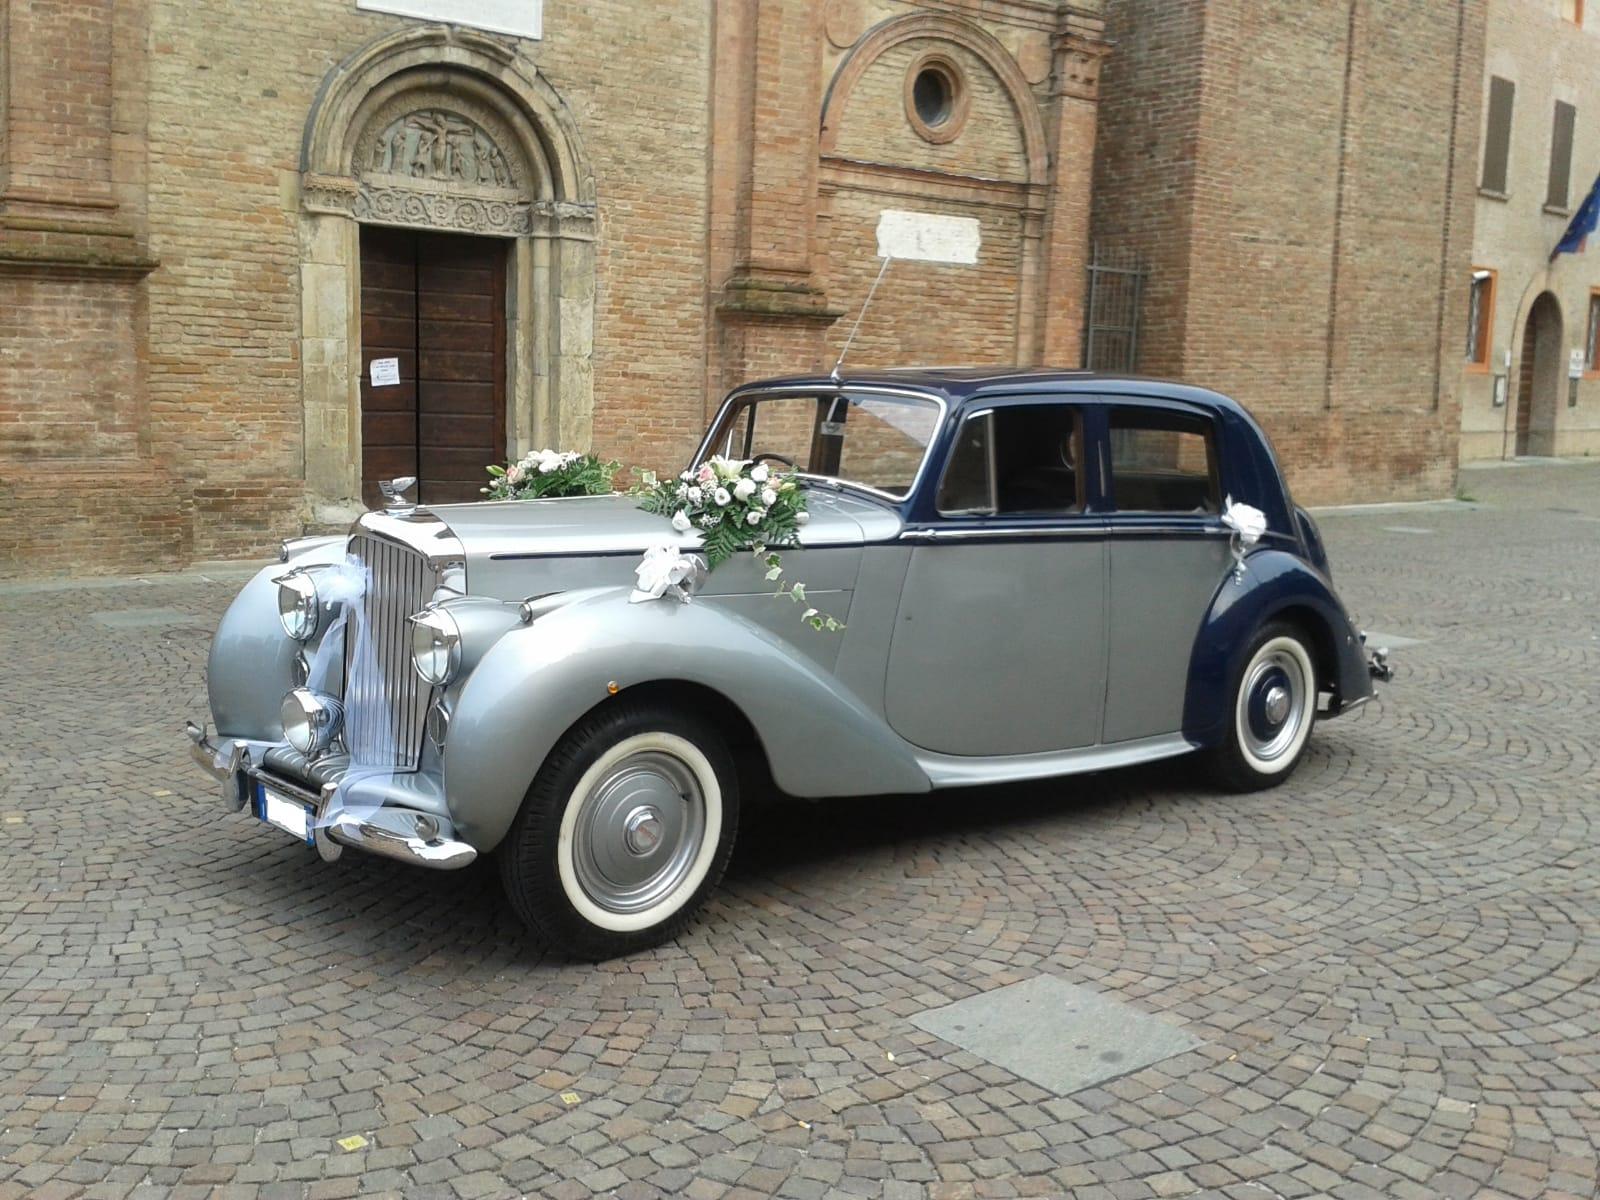 Luxury Top Car Bentley MK6 - Auto d'epoca - noleggio auto storiche - auto matrimoni - auto noleggio matrimoni - Noleggio Auto matrimoni - nozze auto - auto matrimonio Roma